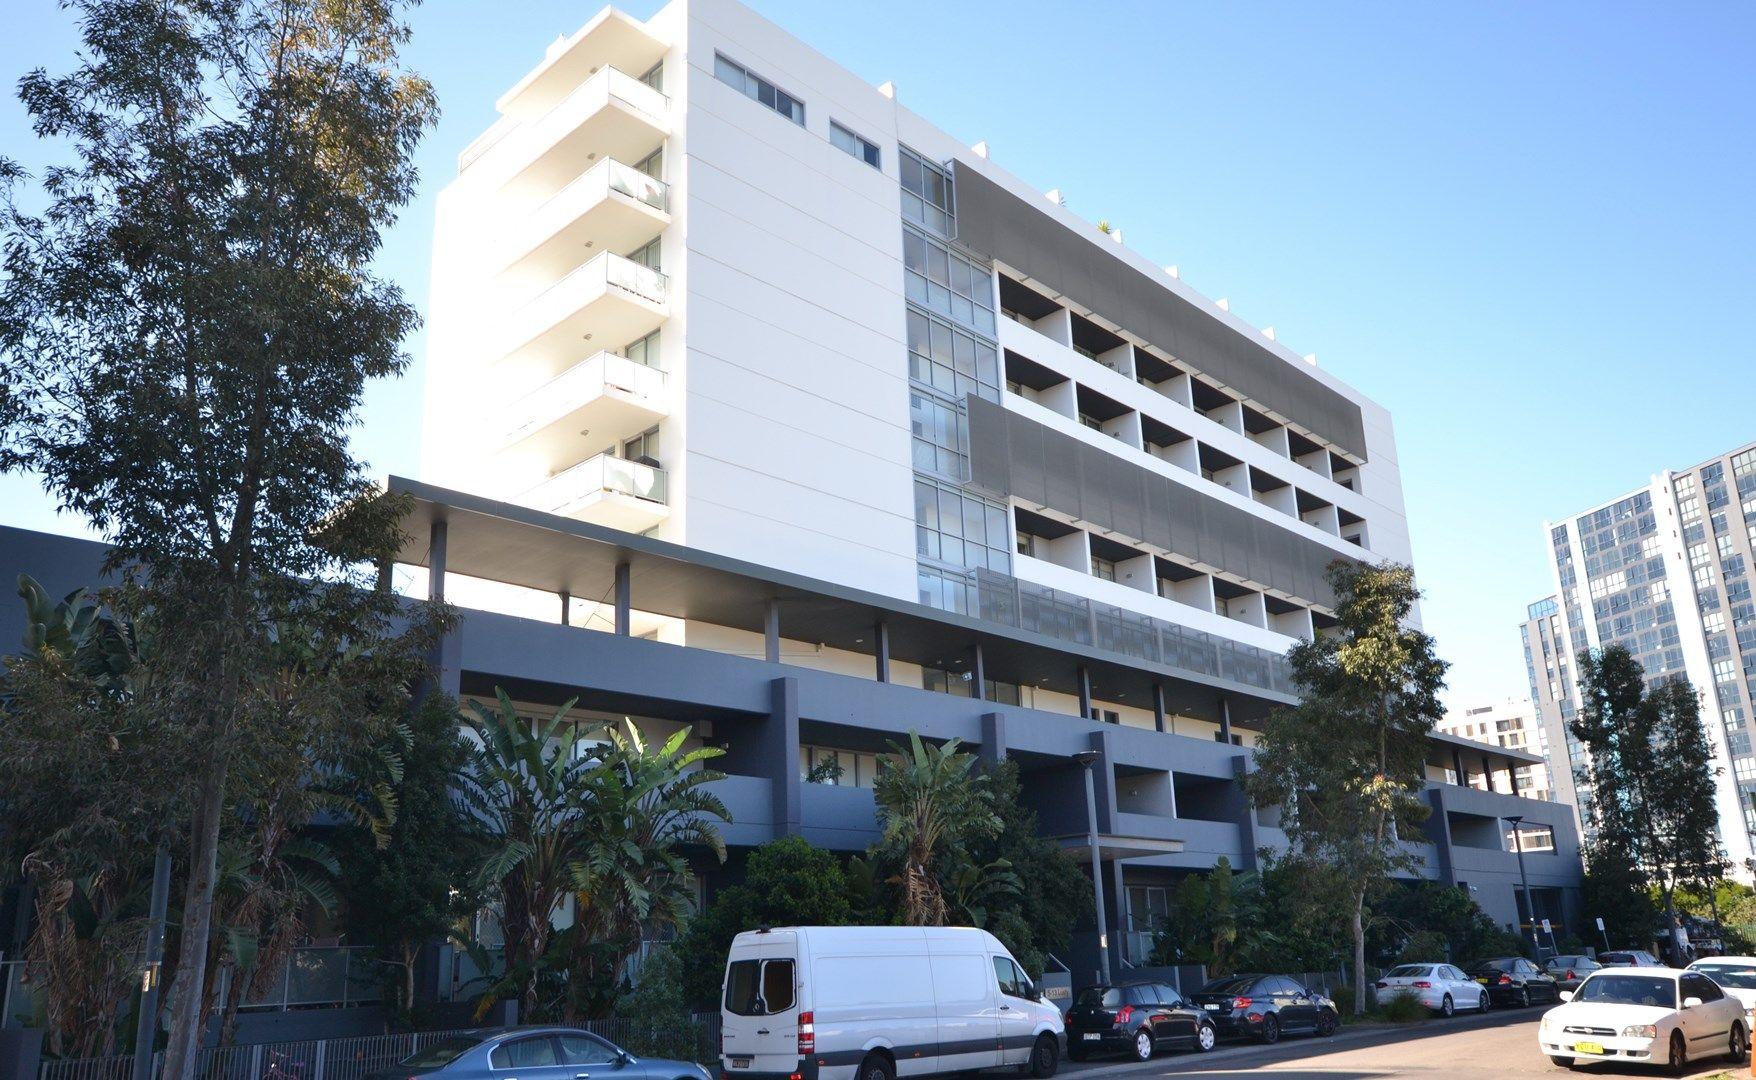 40/5-13 Lusty Street, Wolli Creek NSW 2205, Image 0